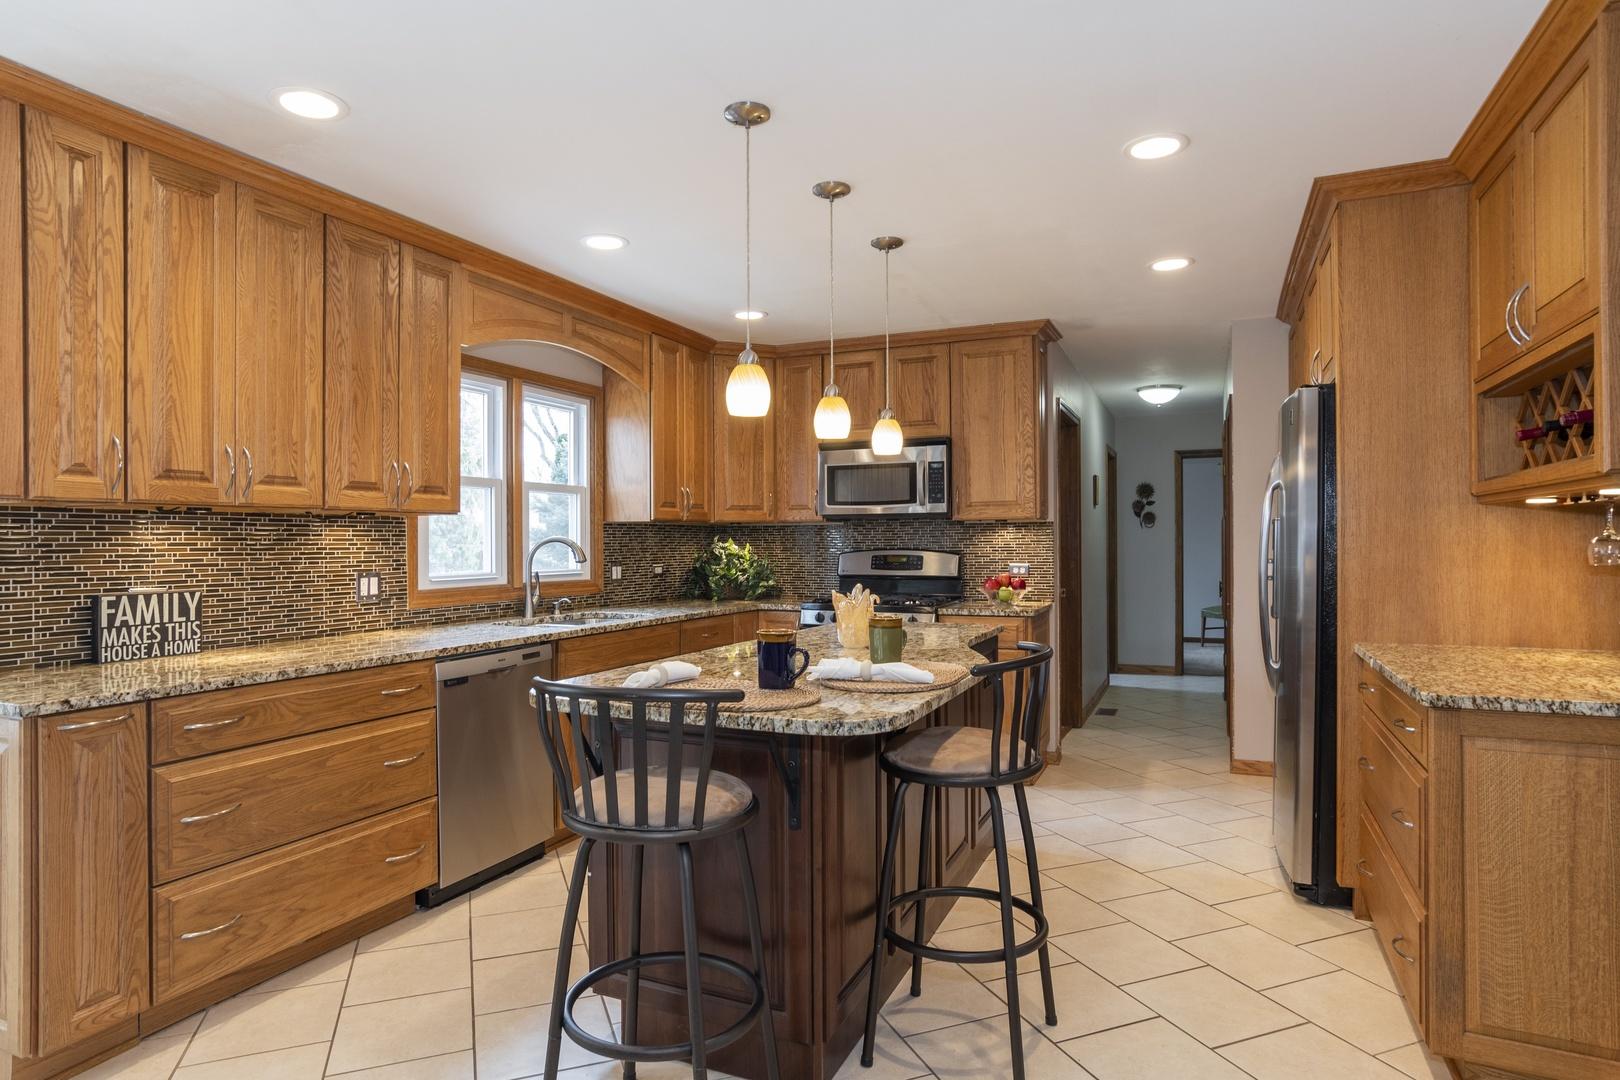 Cabinet Makers In Wheaton Il | Cabinets Matttroy